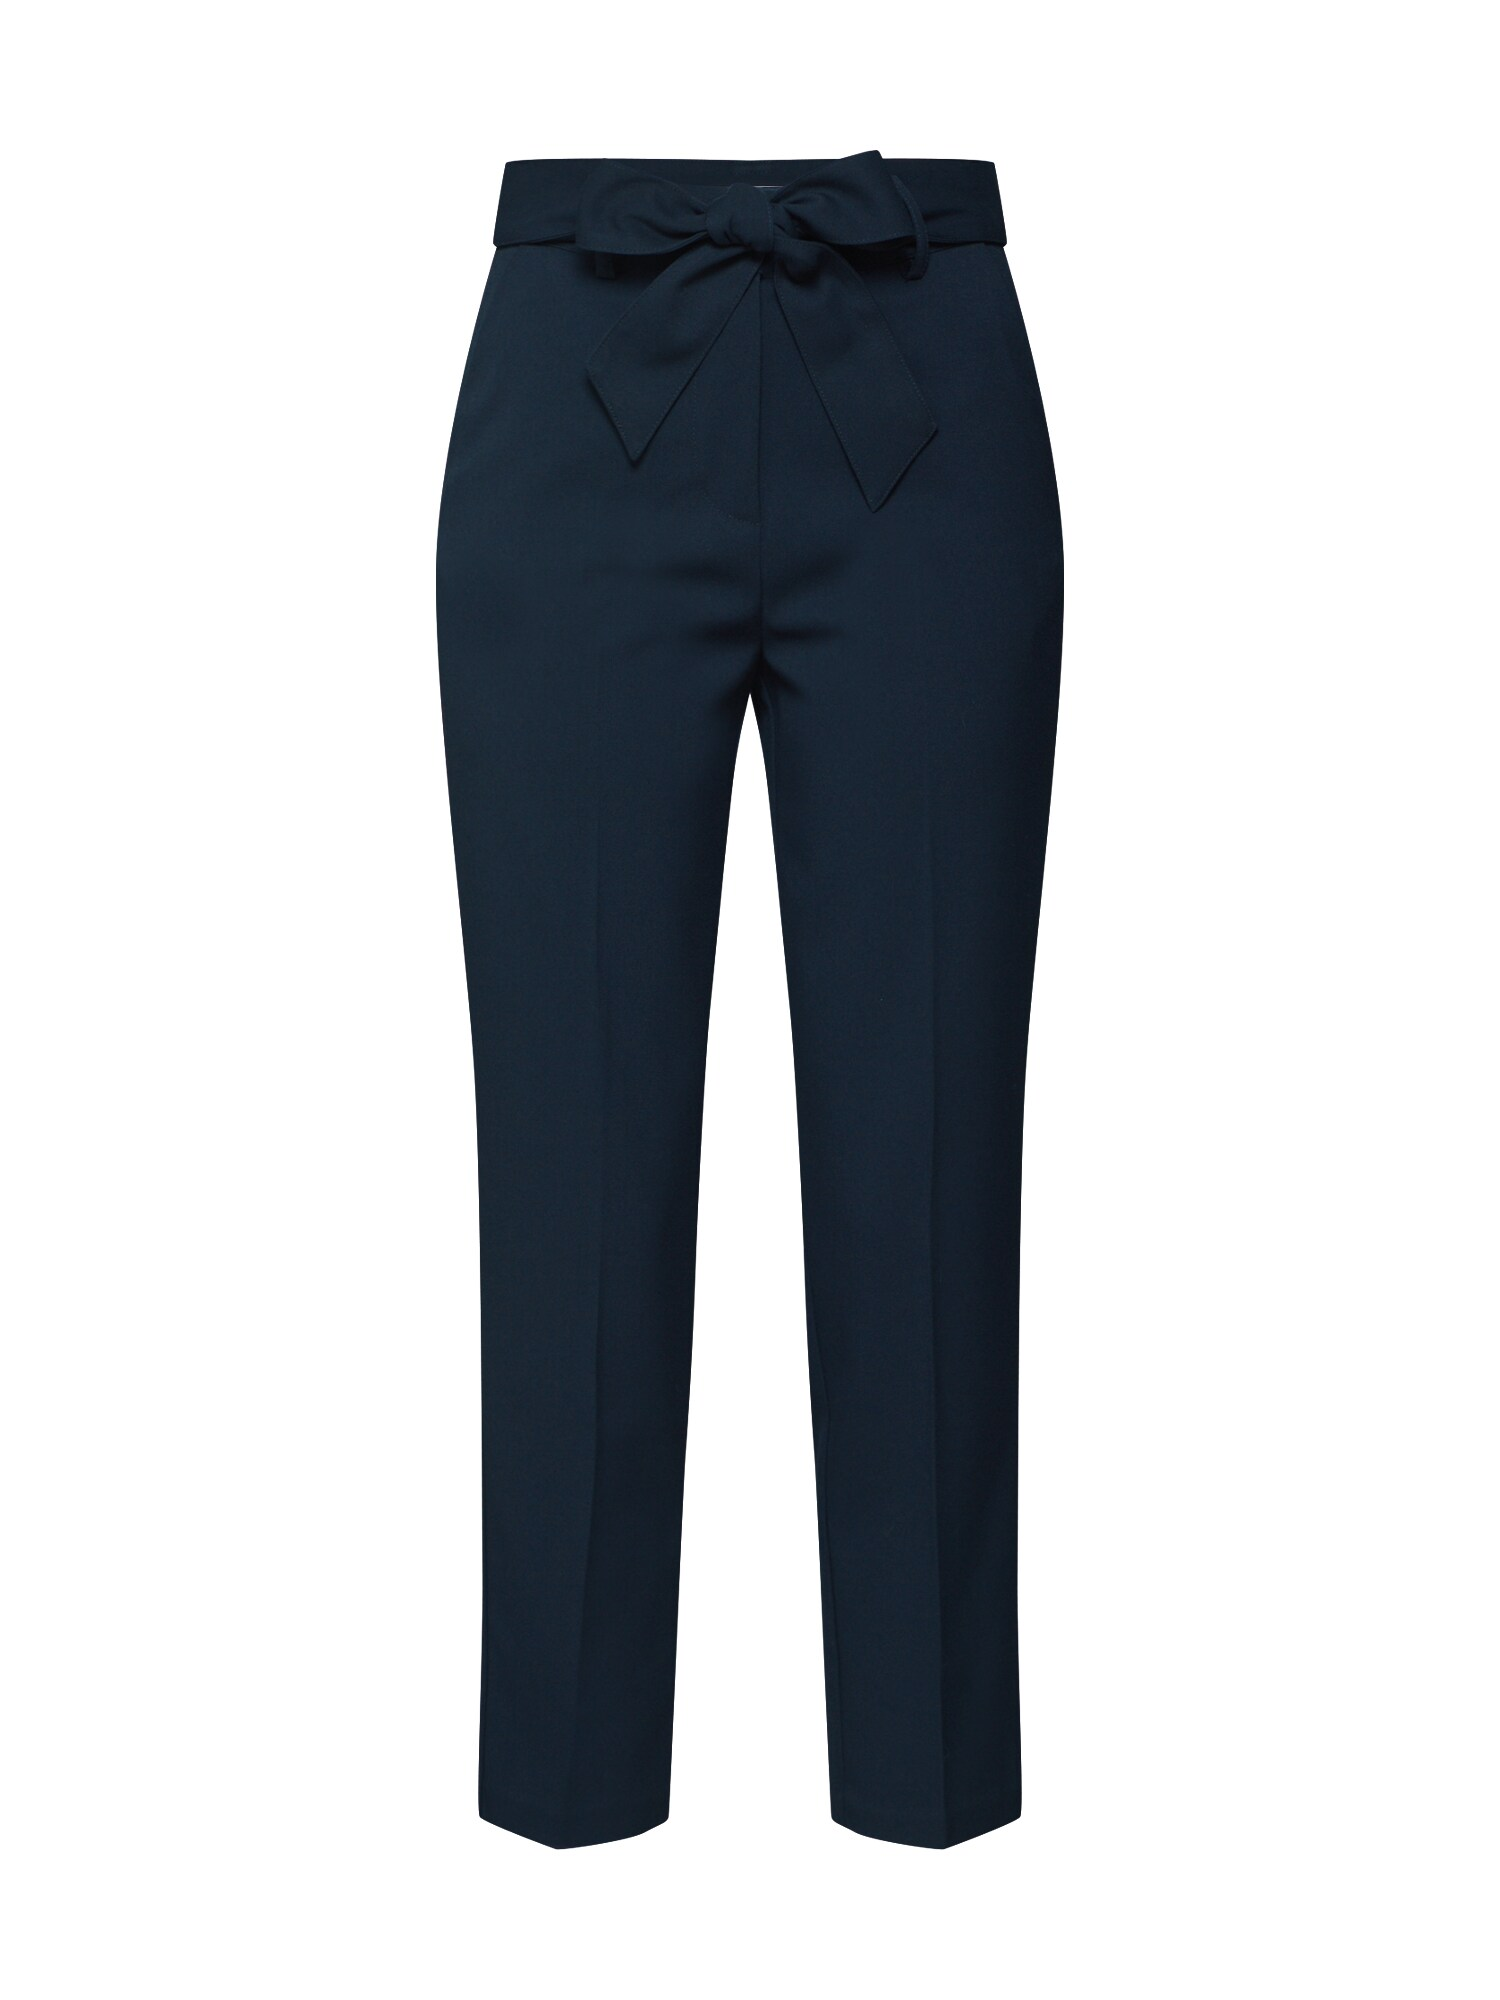 EDITED Kelnės su kantu 'Bobby' nakties mėlyna